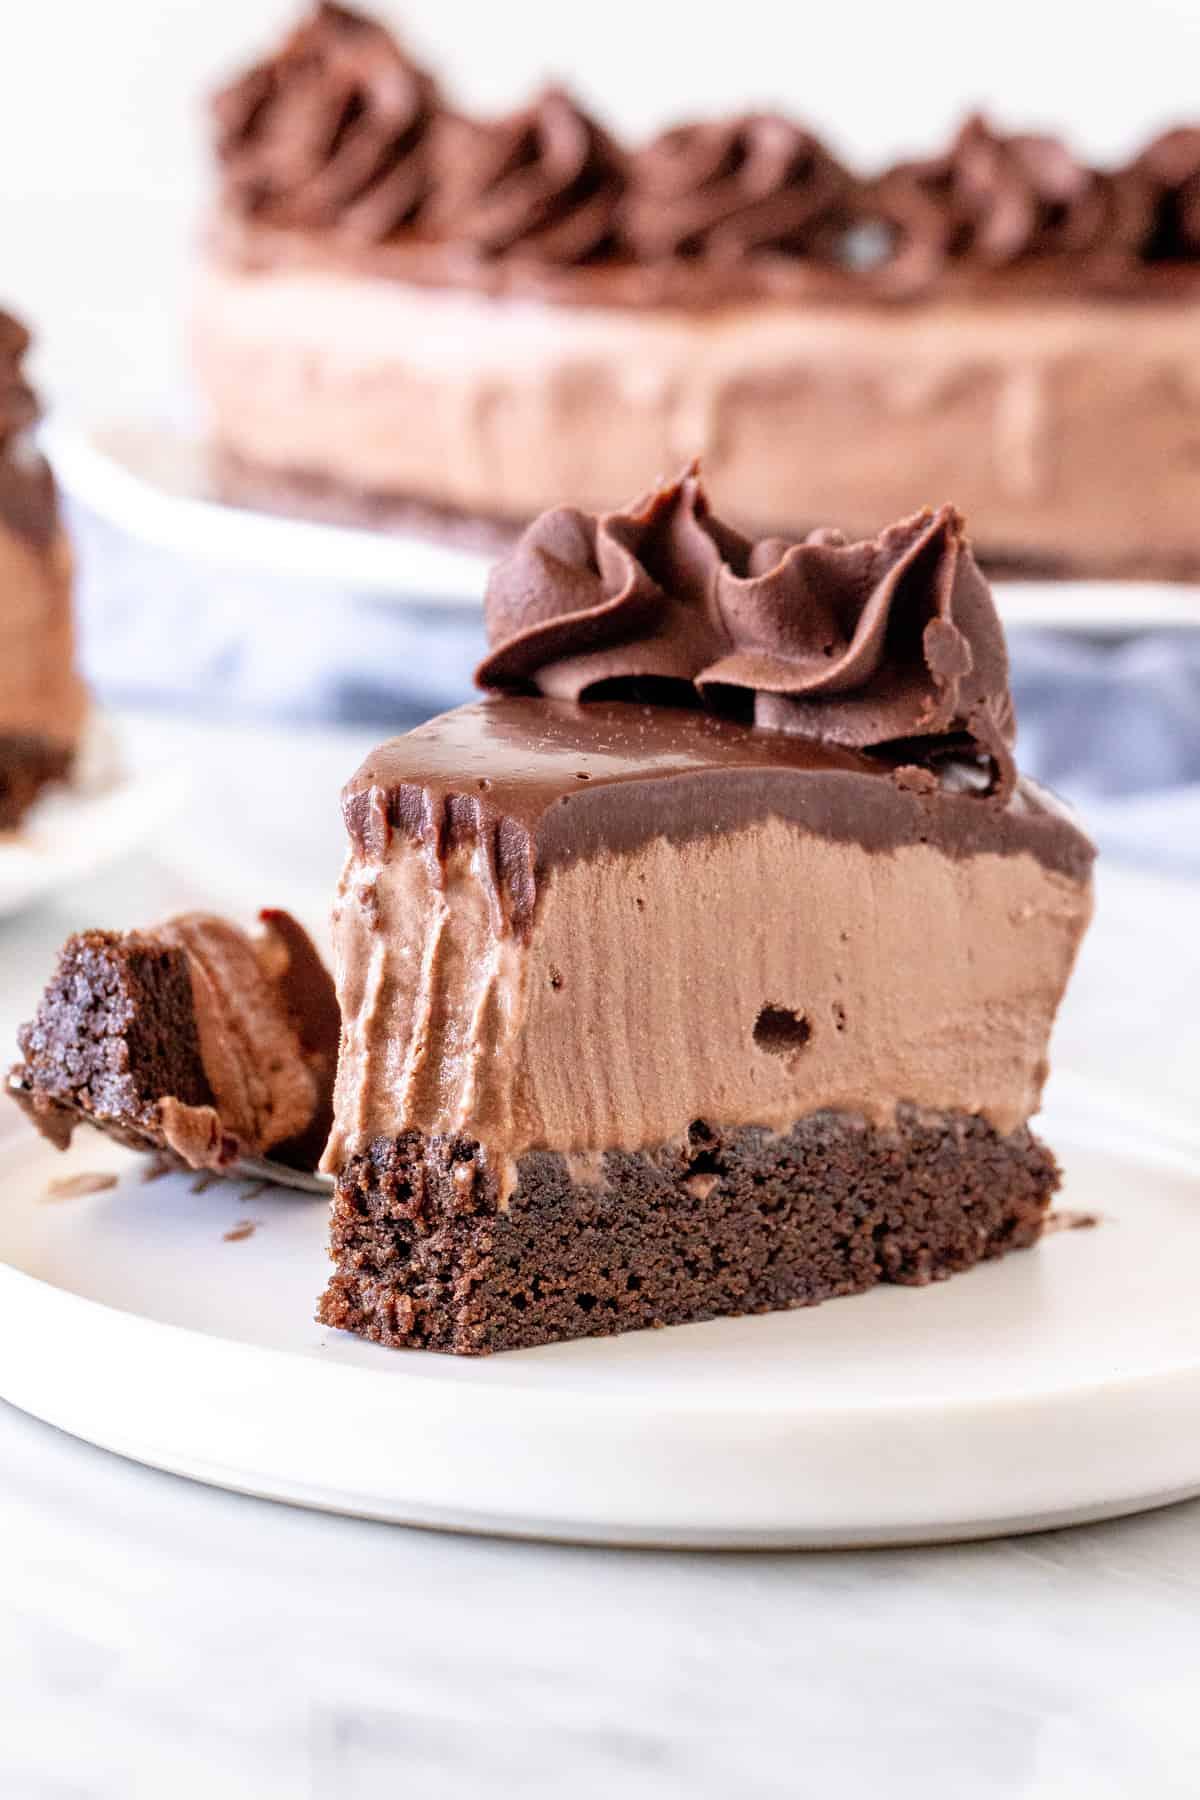 Slice of ice cream cake with a bite.